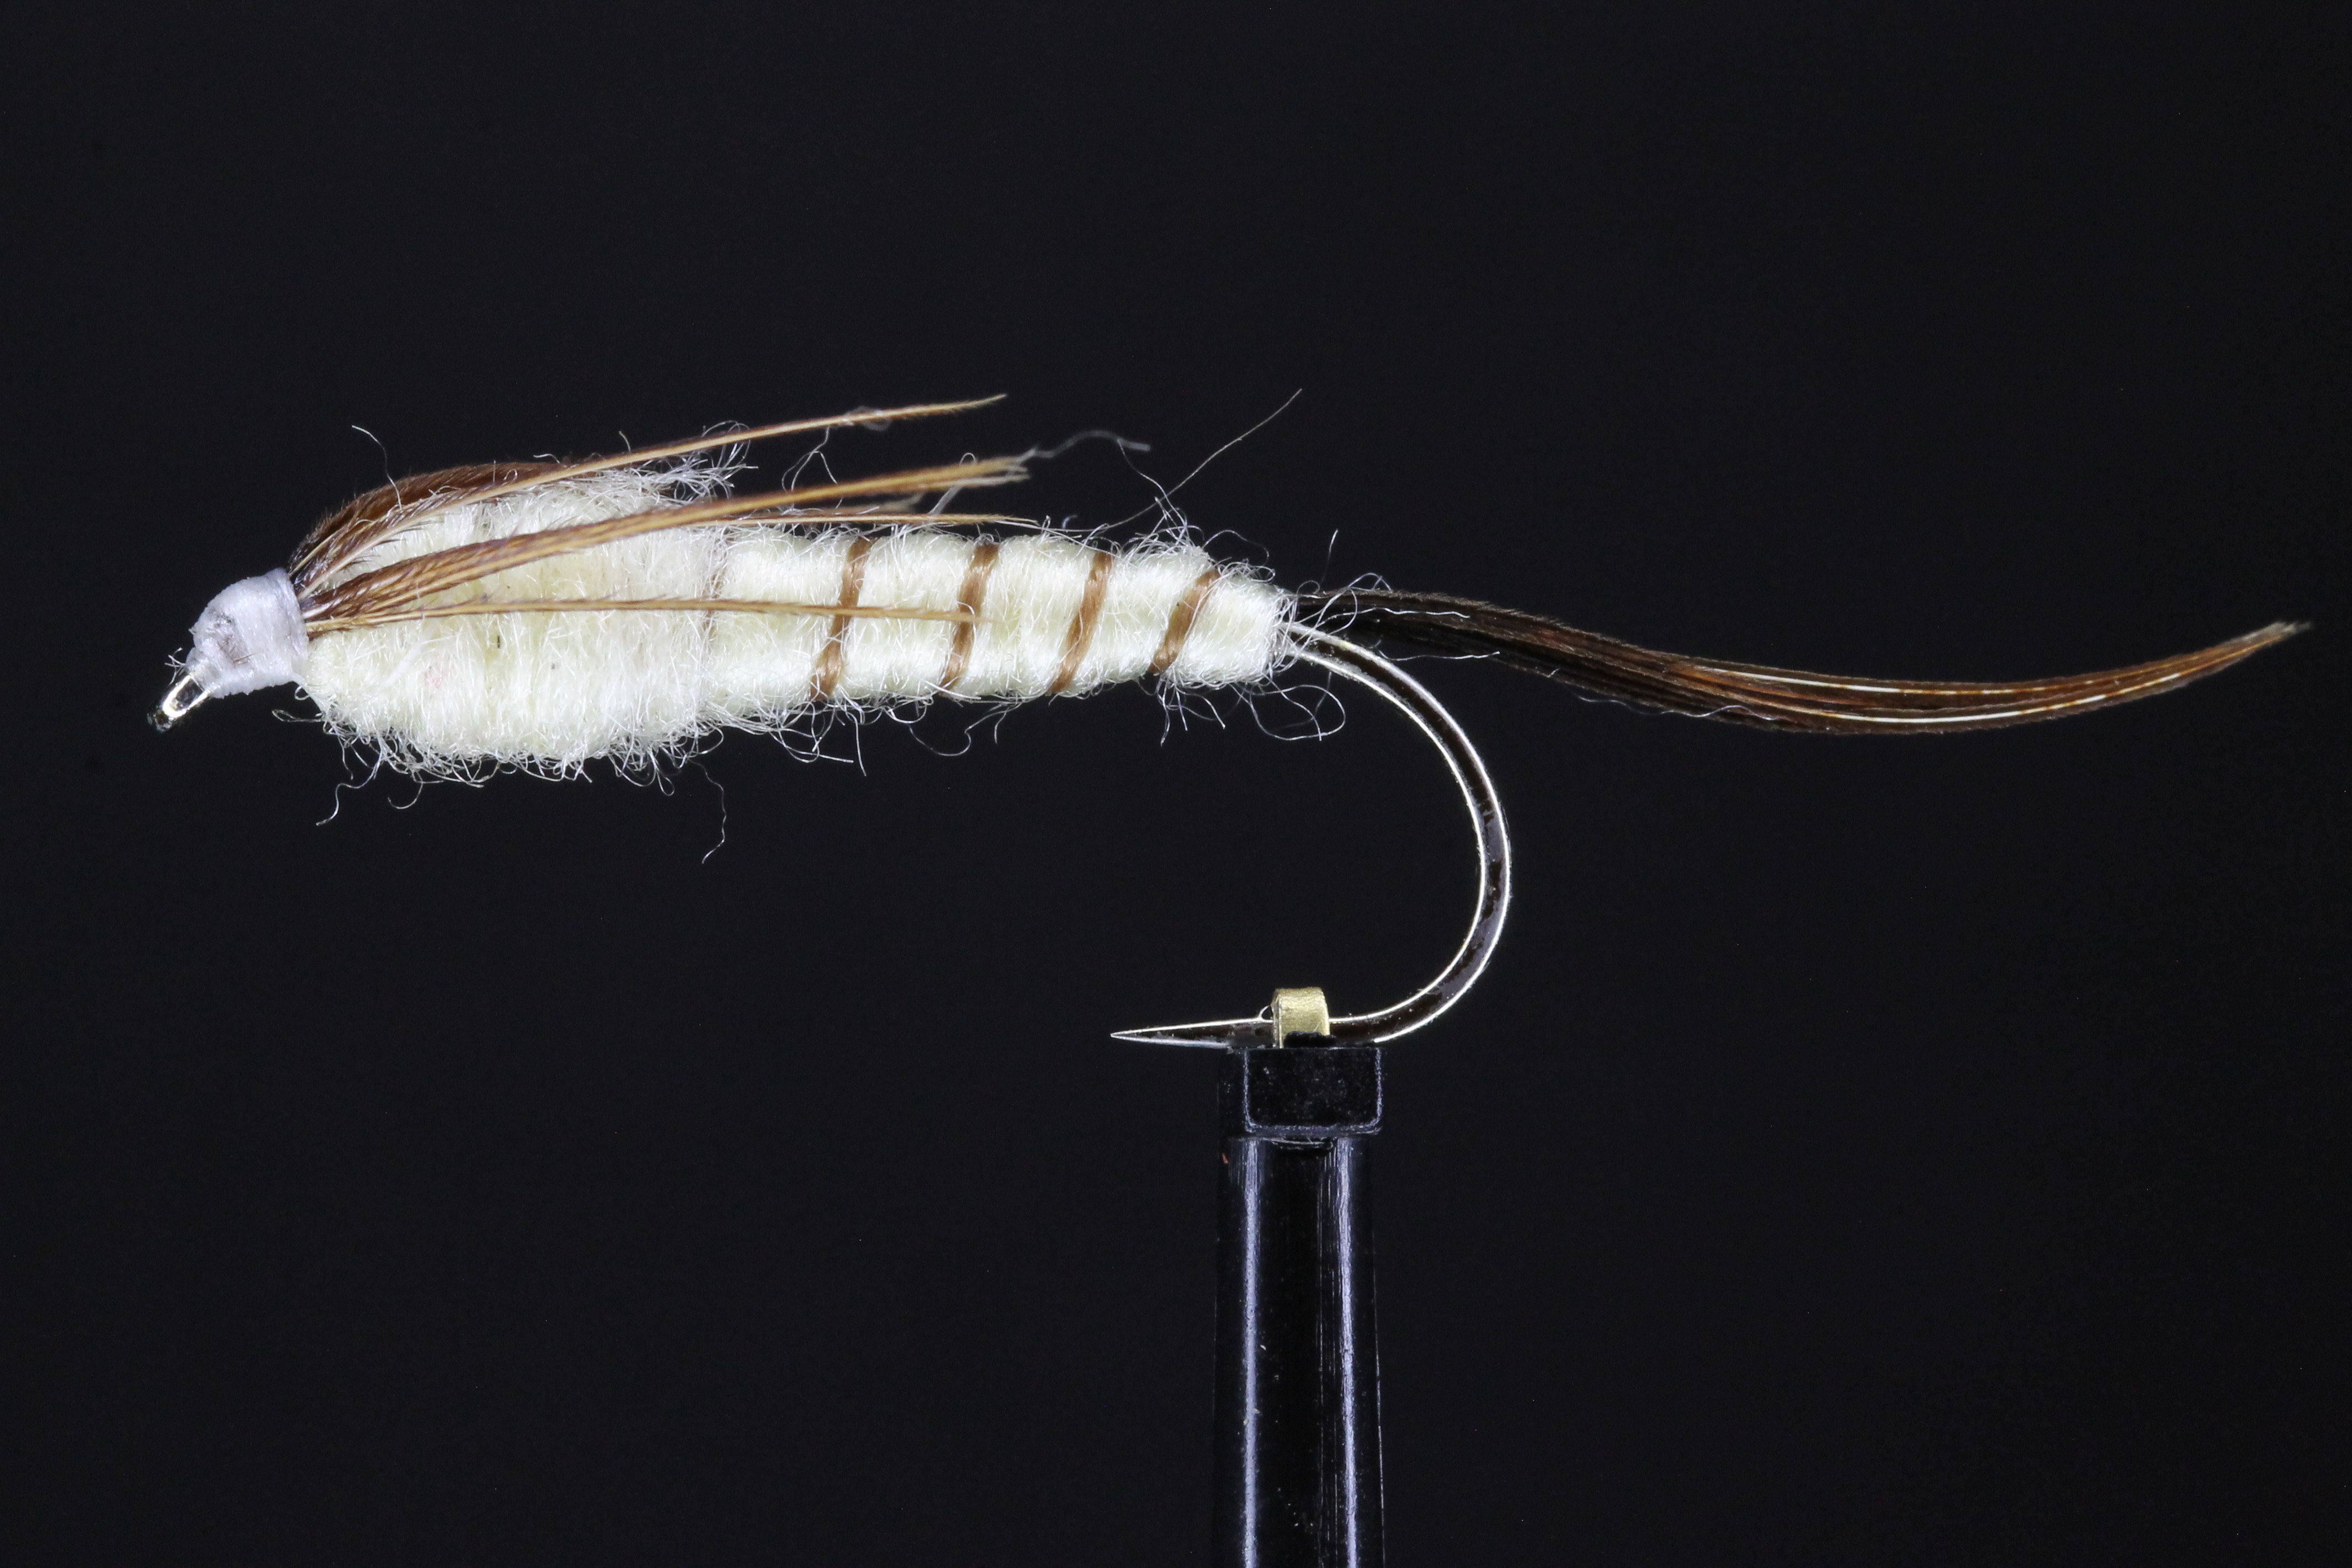 Long shank Mayfly Nymph